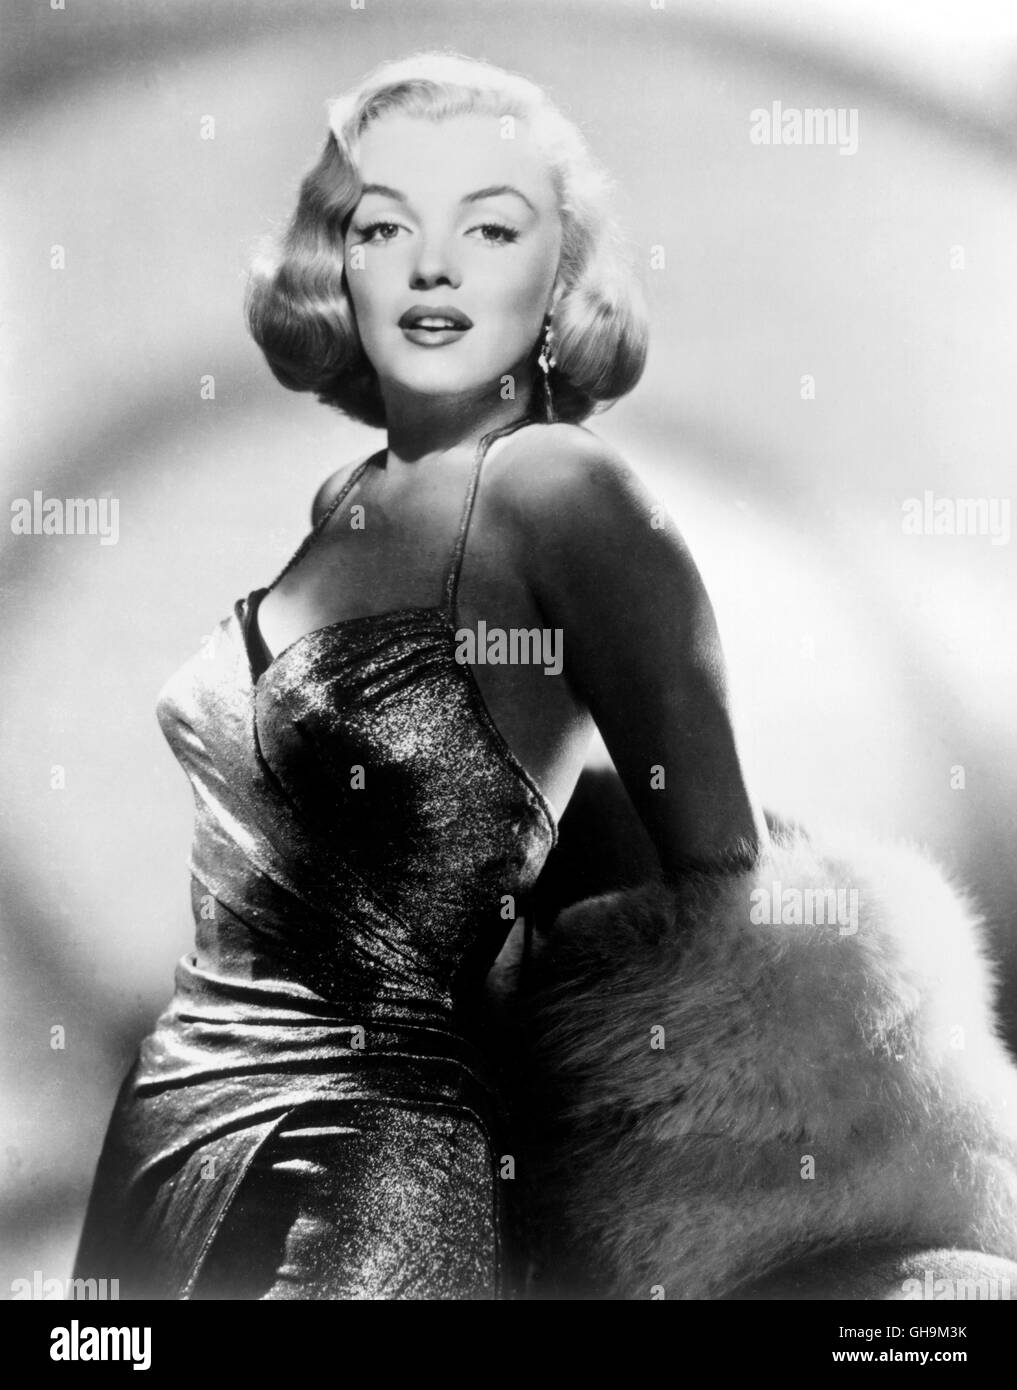 MARILYN MONROE, Portrait um 1950. - Stock Image